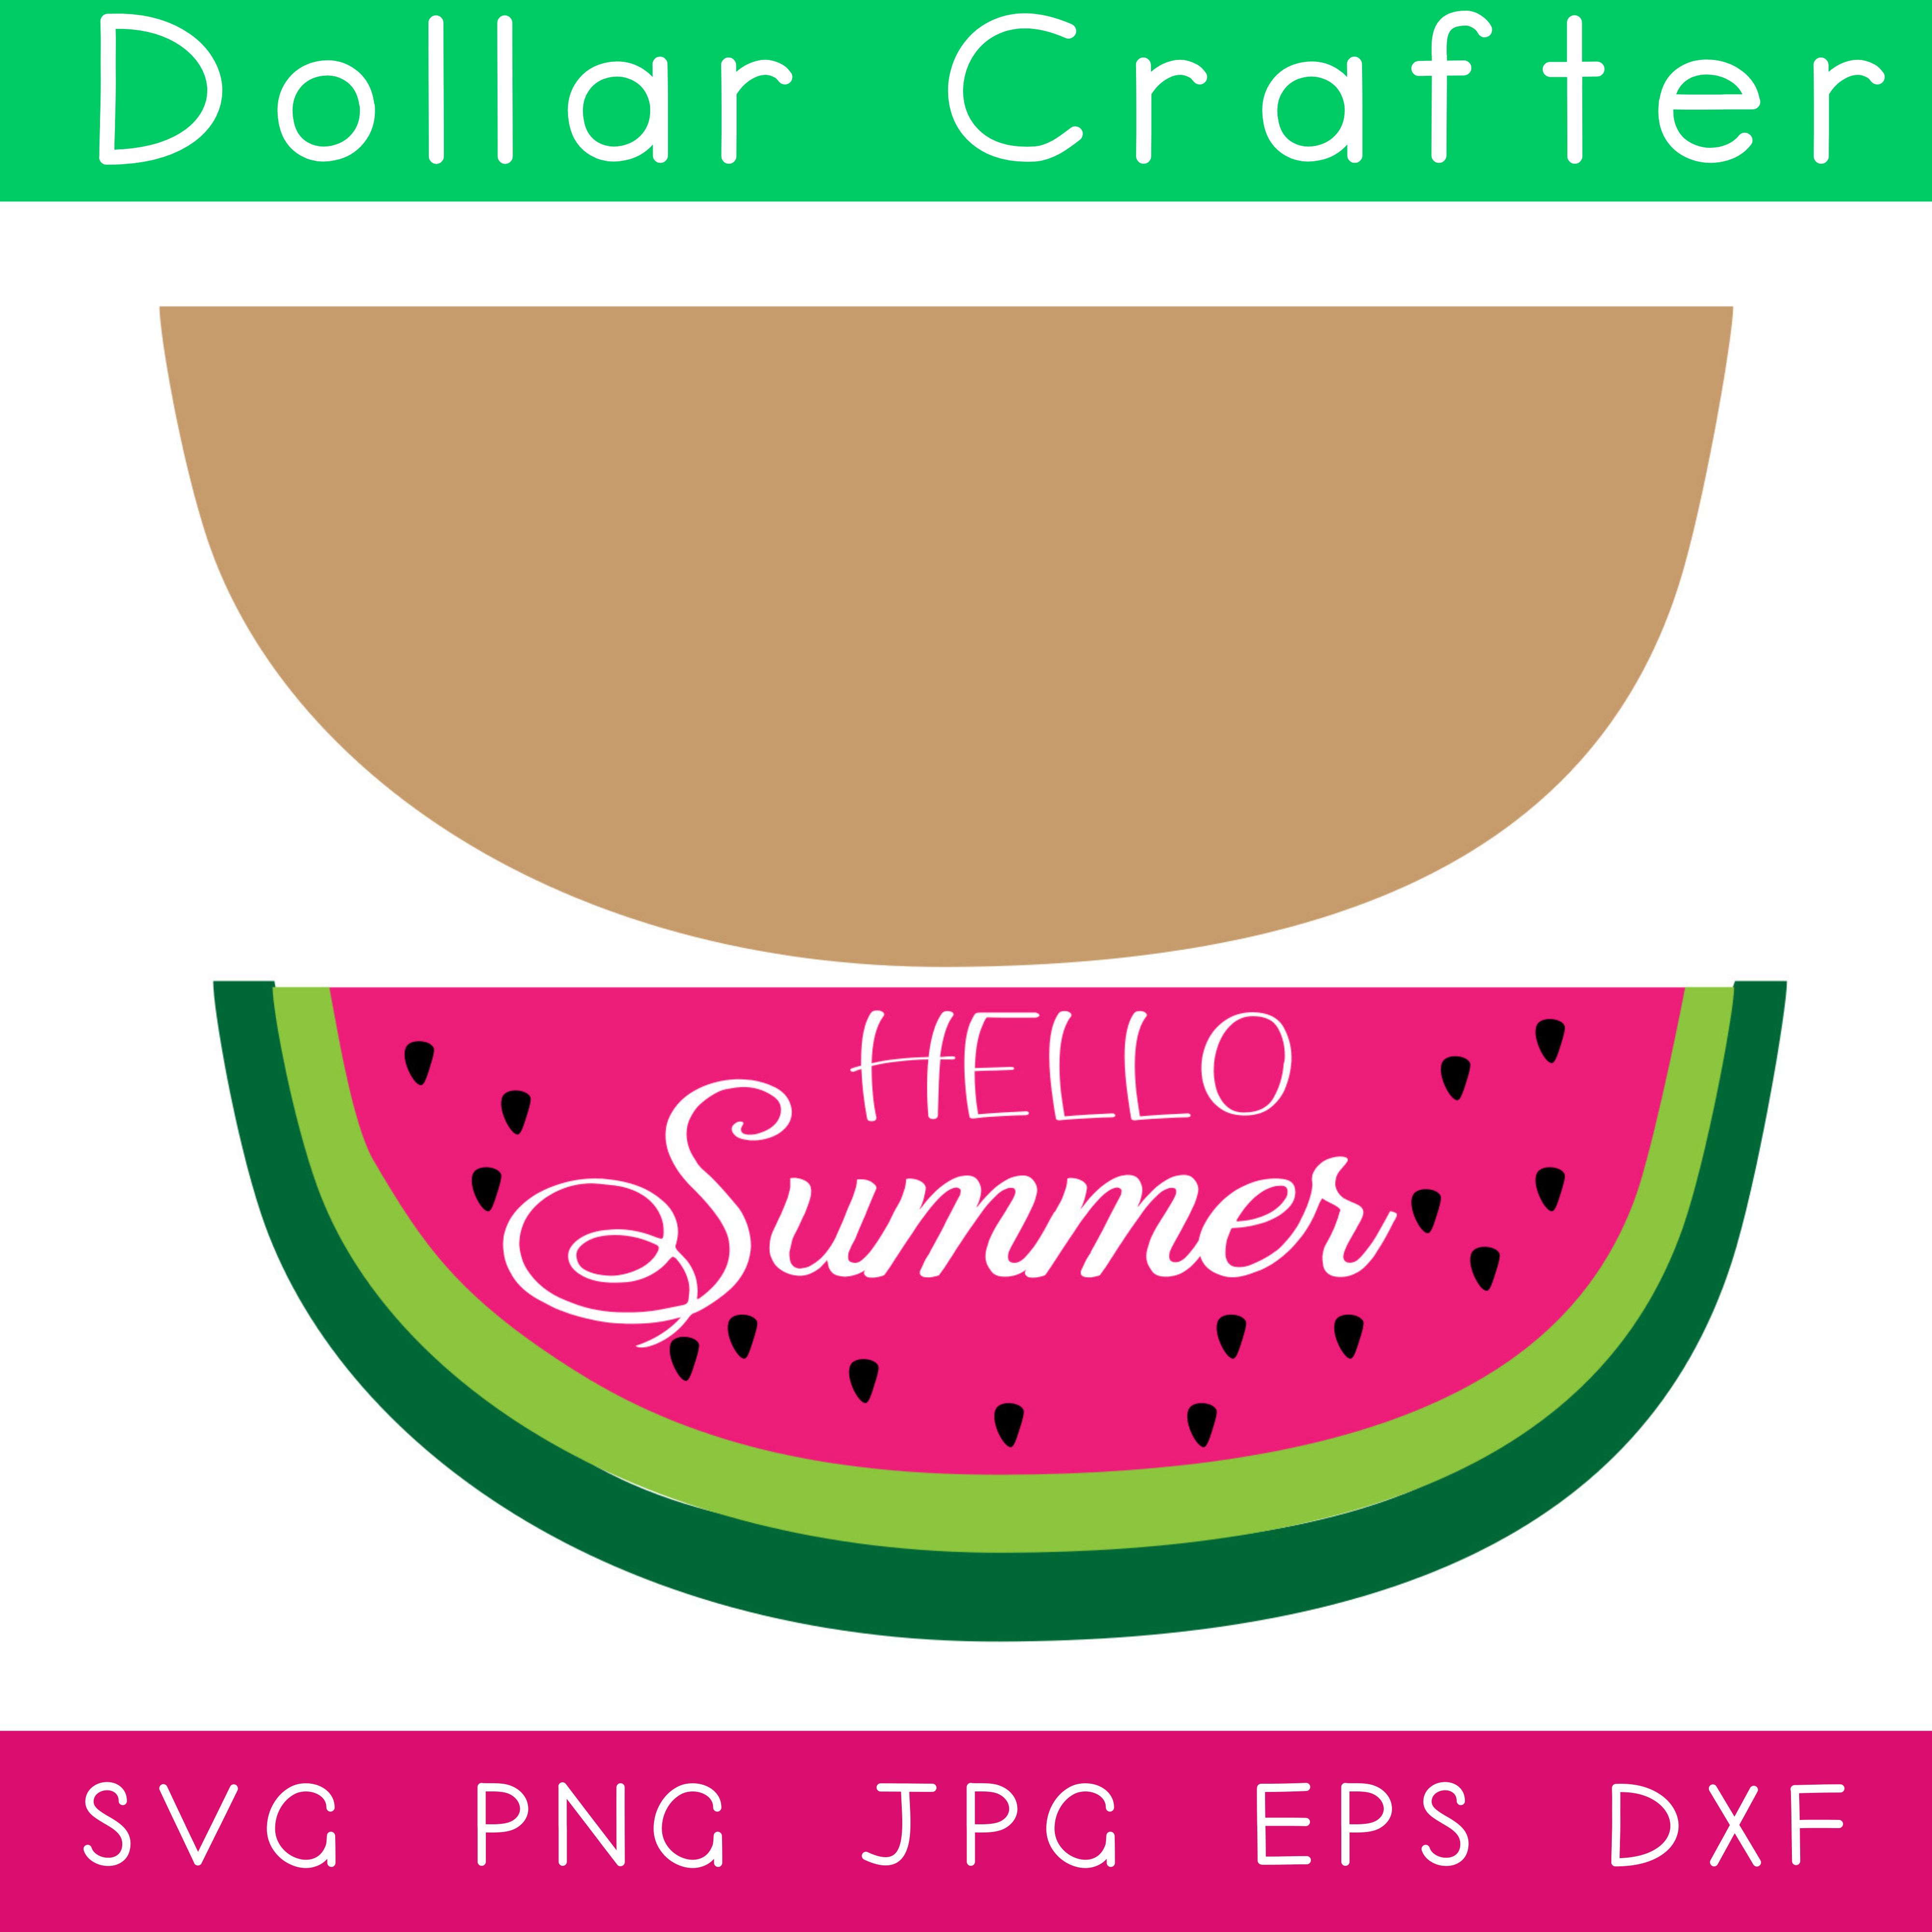 Hello Summer Watermelon SVG Cut File Set for Cricut or Silhouette